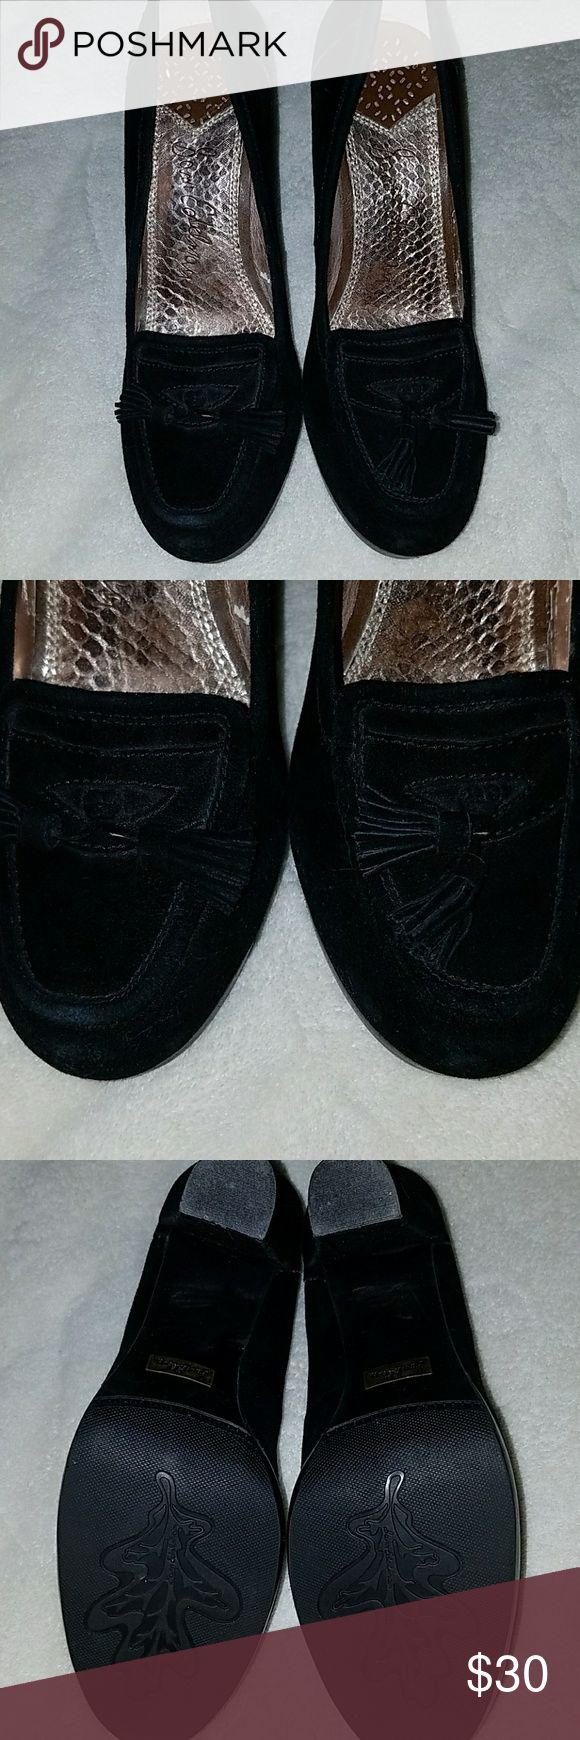 Sam Edleman heeled suede tassle loafers Sam Edleman heeled suede tassle loafers, some rubbing and rub off inside, see pictures. 4 inch block heel with .5 inch platform. Sam Edelman Shoes Heels